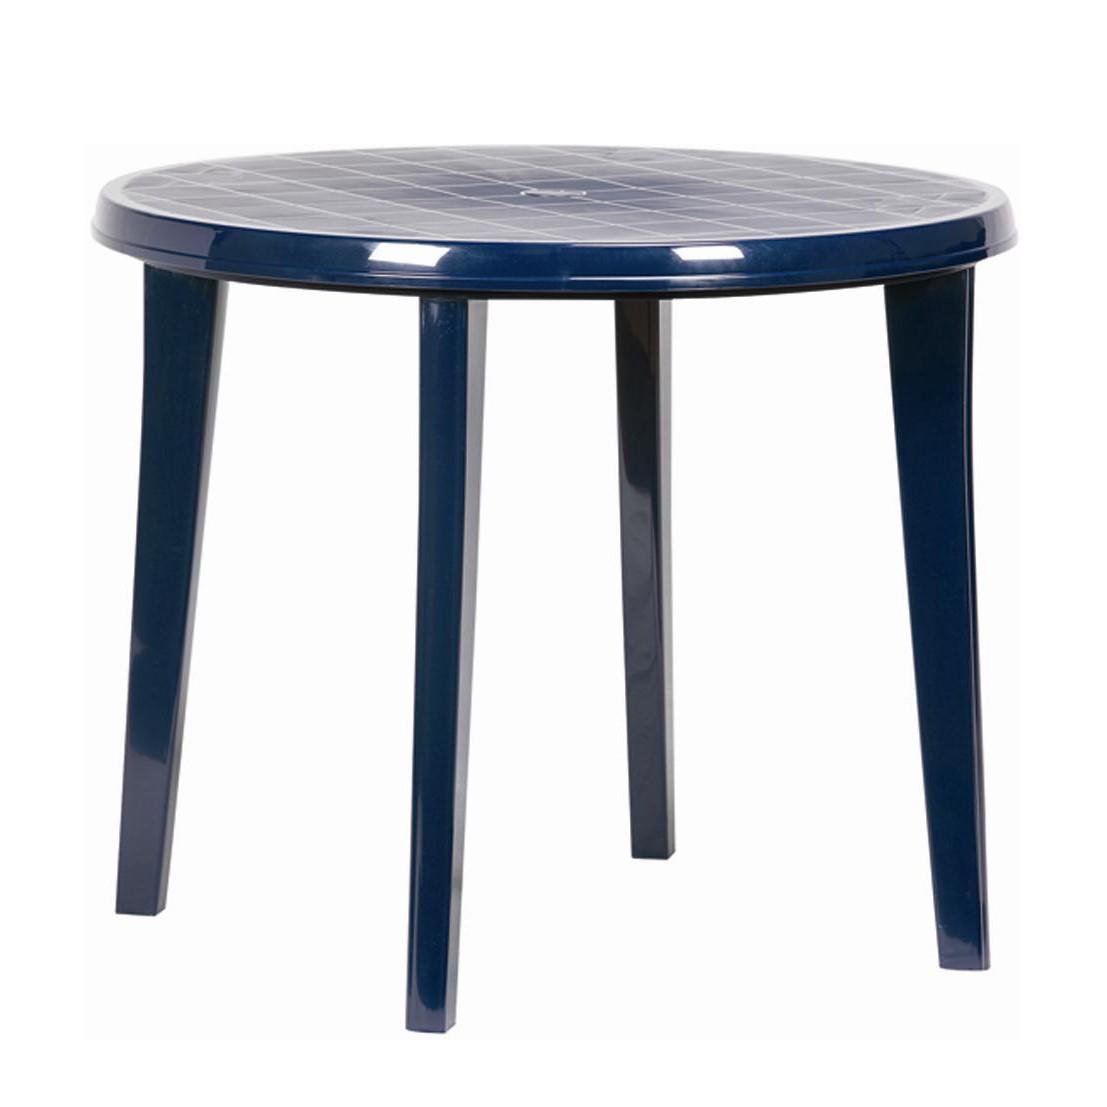 Gartentisch Kunststoff Blau Gartentisch Metall Eckig Top Vanage